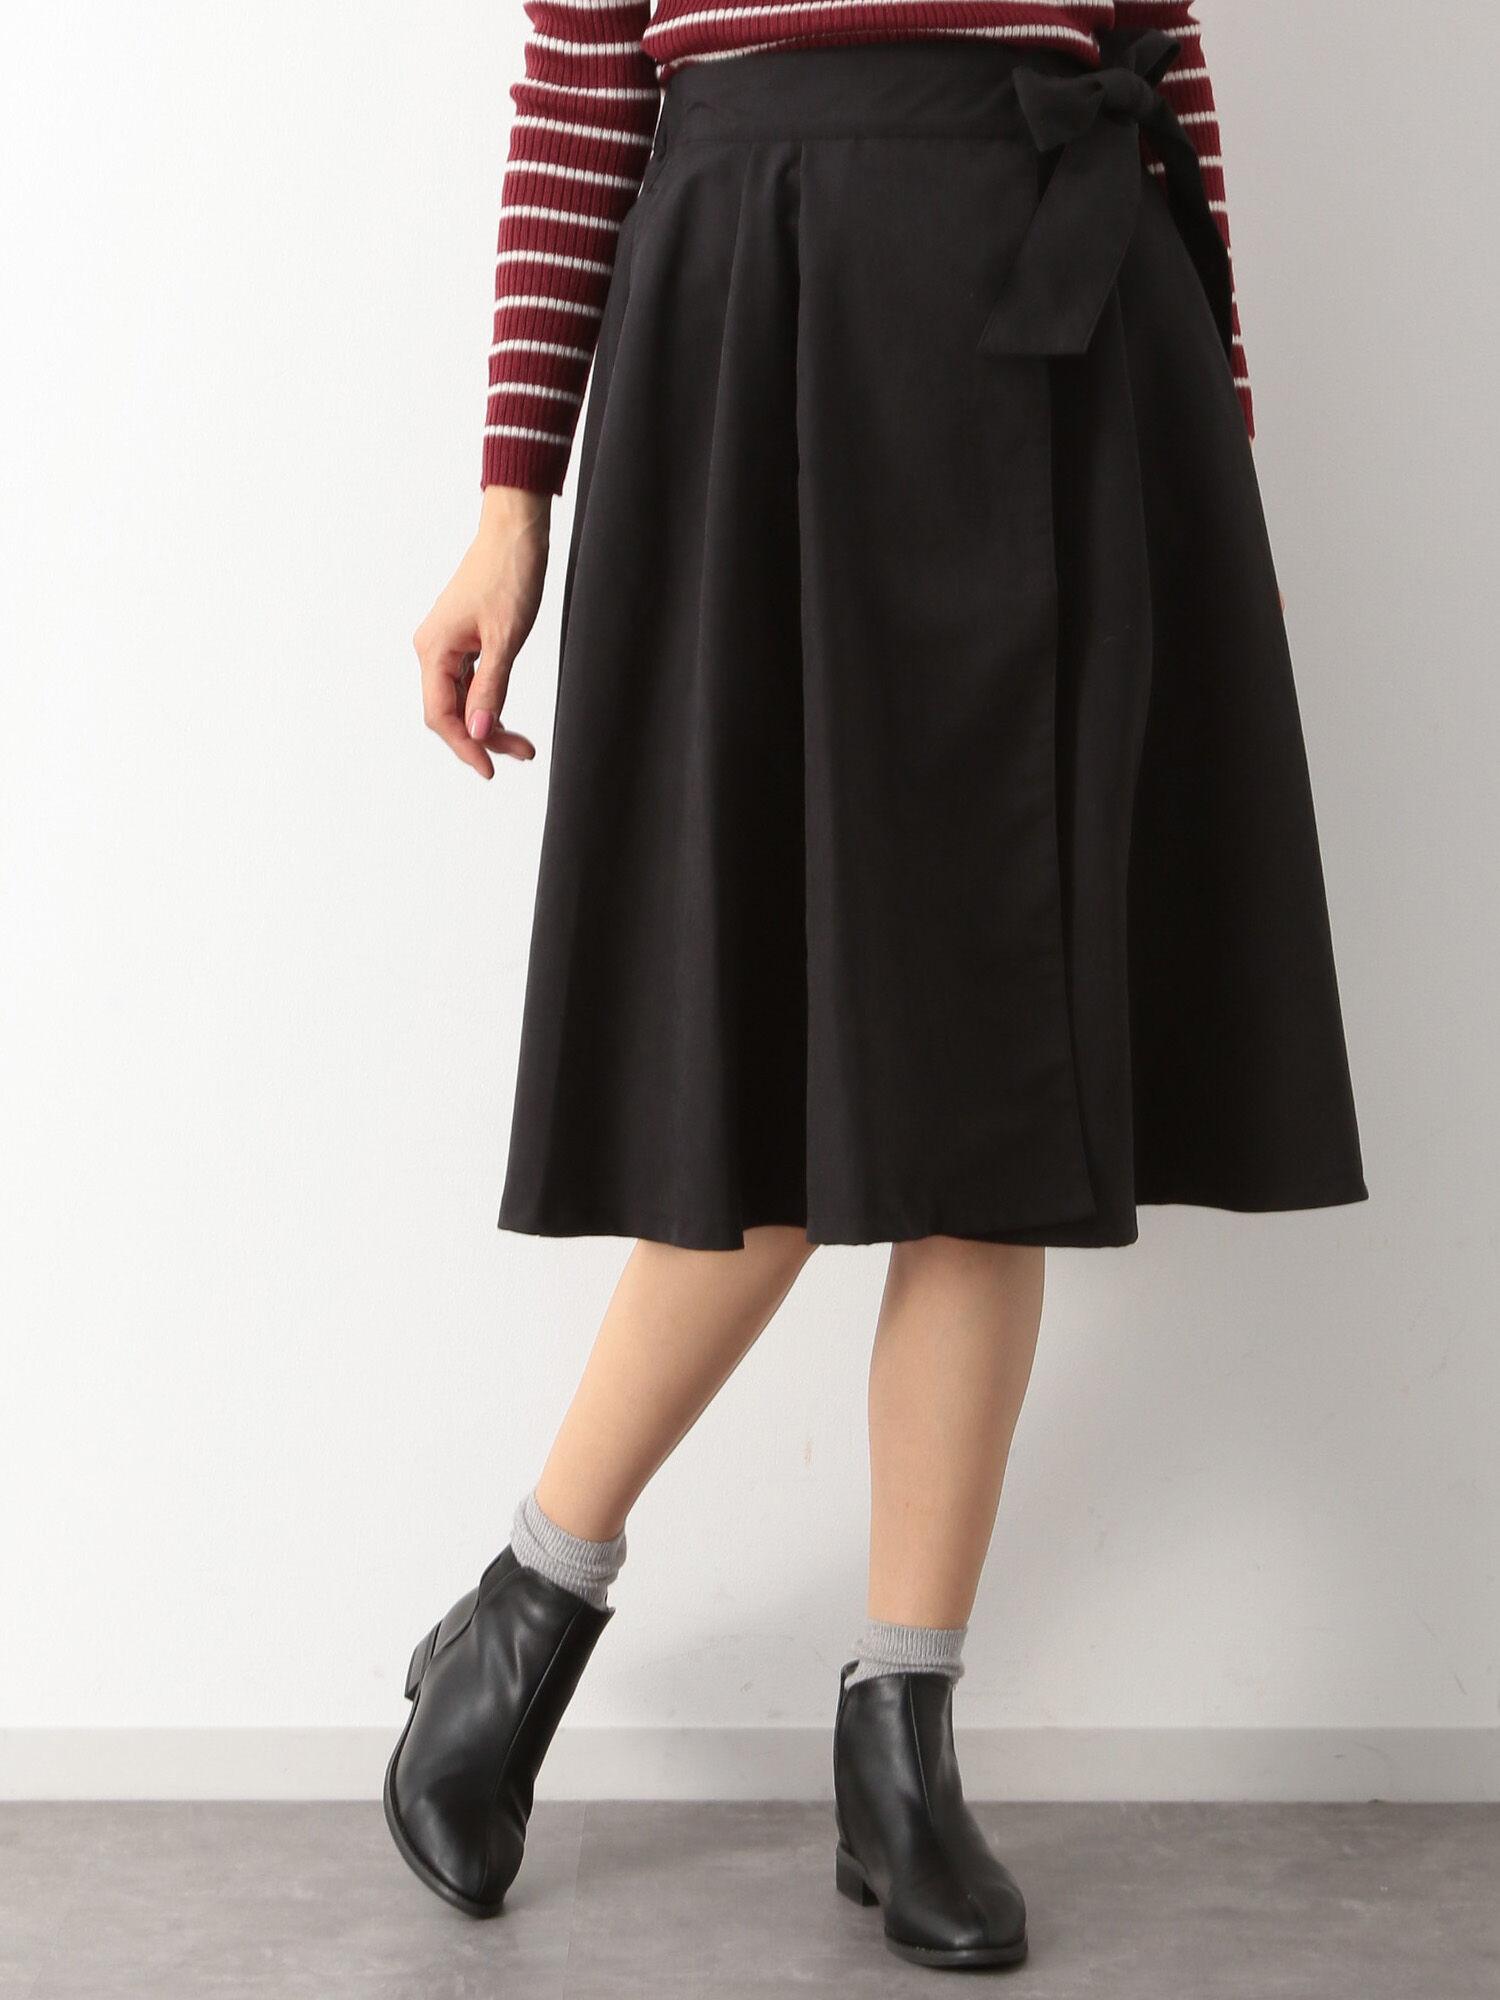 WINHEART・ピーチフレア巻きスカート